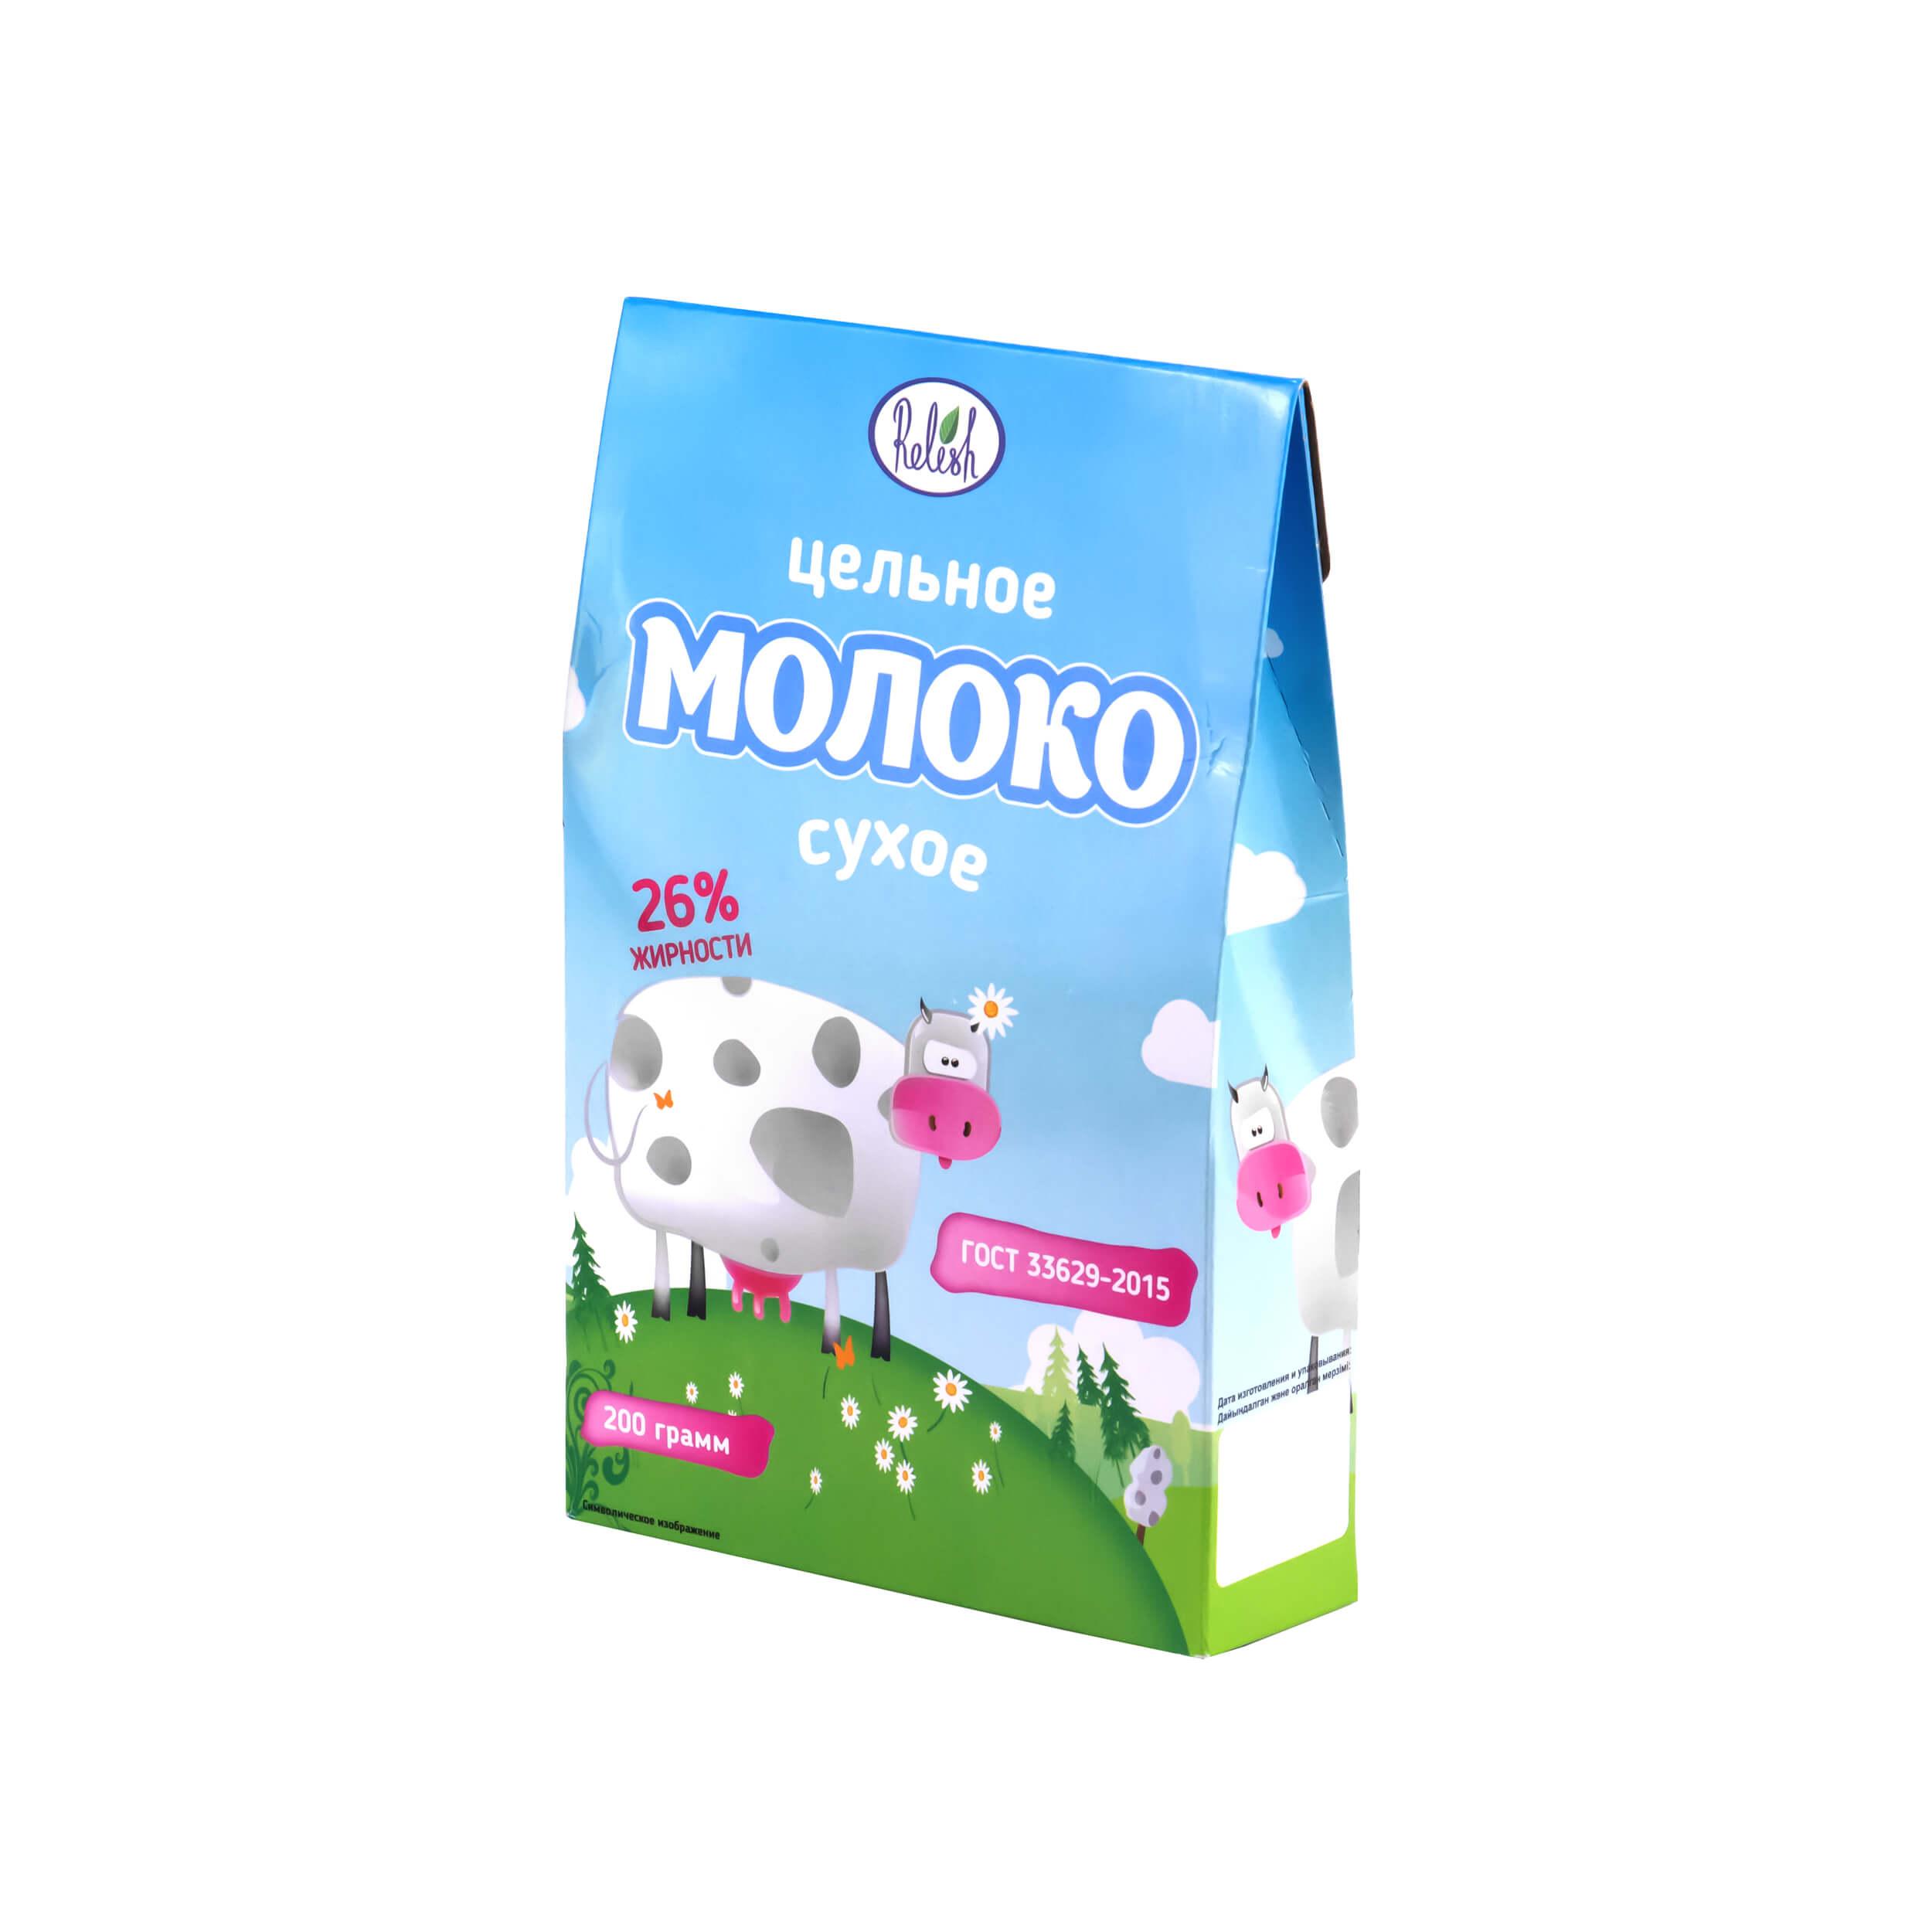 Молоко сухое (200 грамм) фото